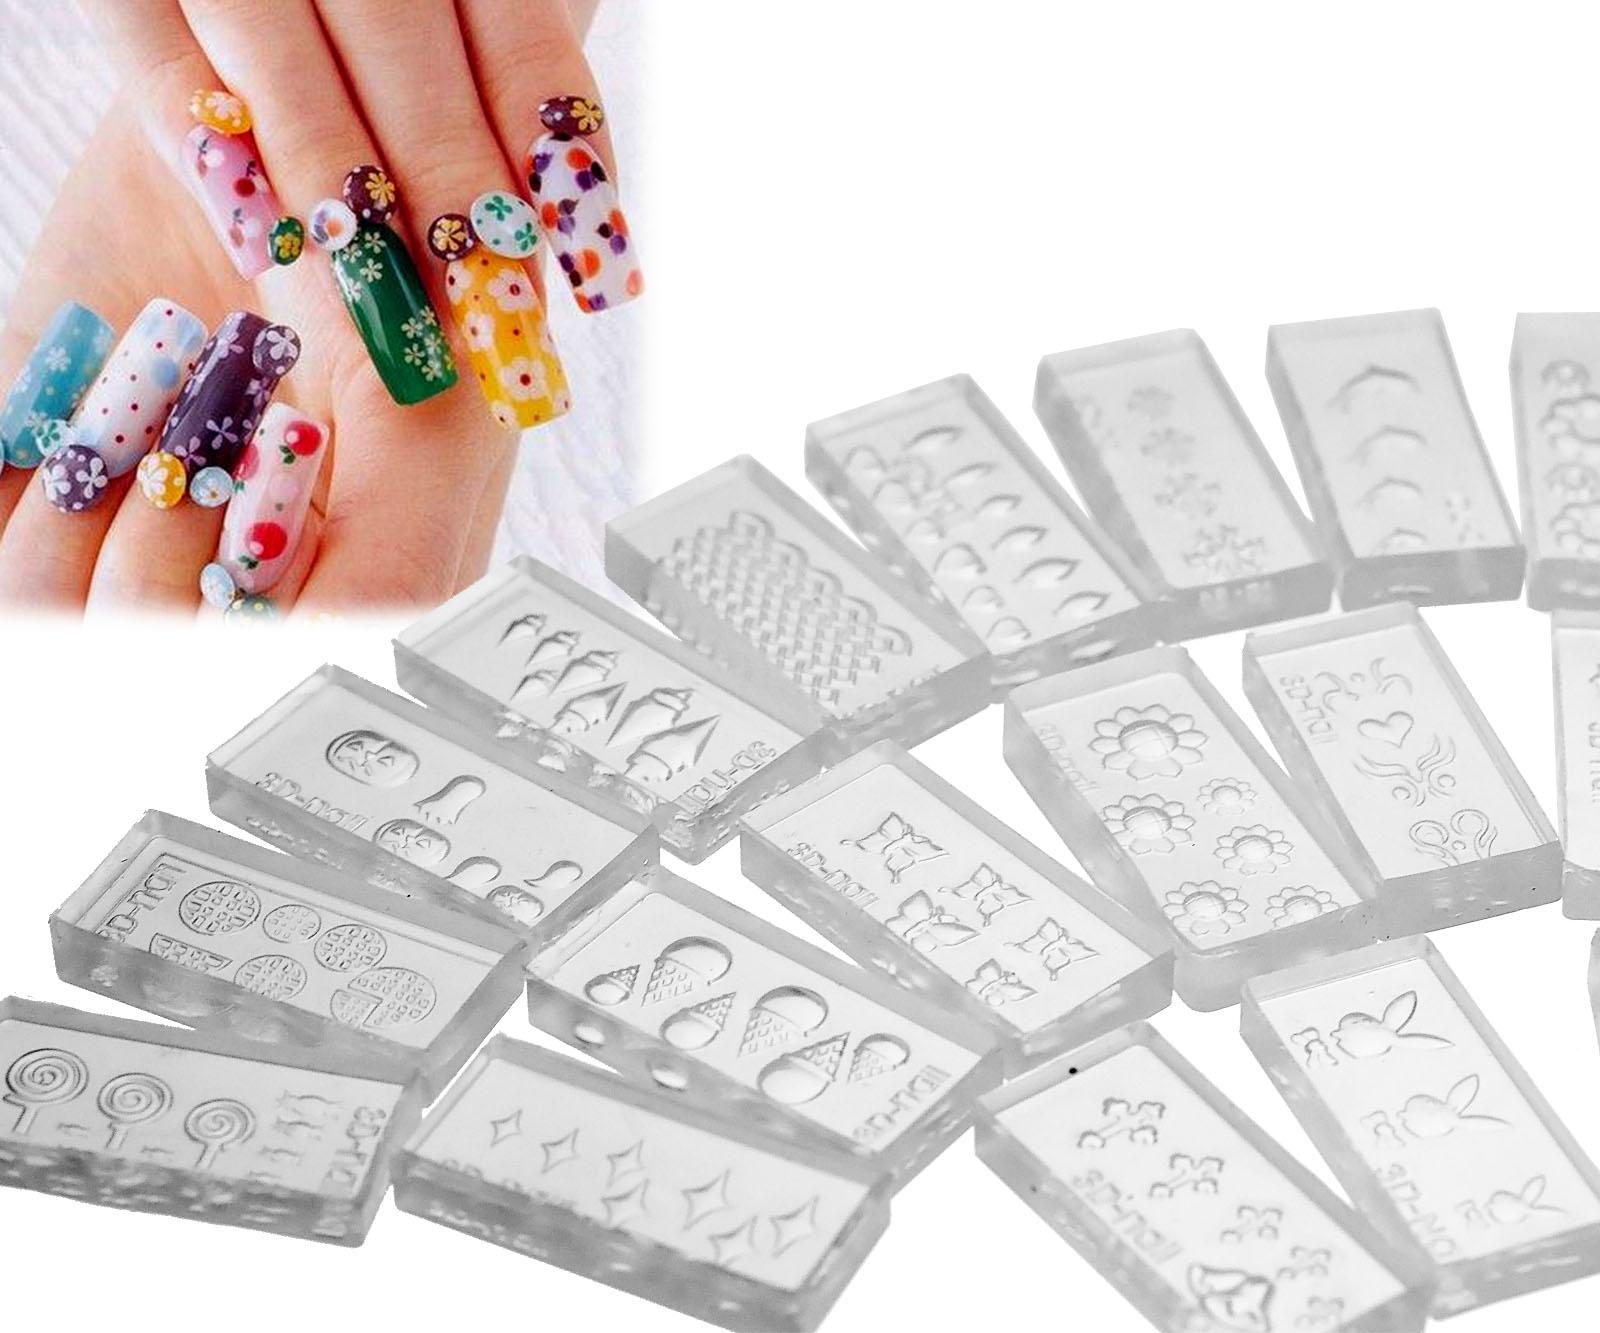 30 pattern 3d acrylic nail art tips mold diy decoration kit for 3d acrylic nail art mold diy decoration